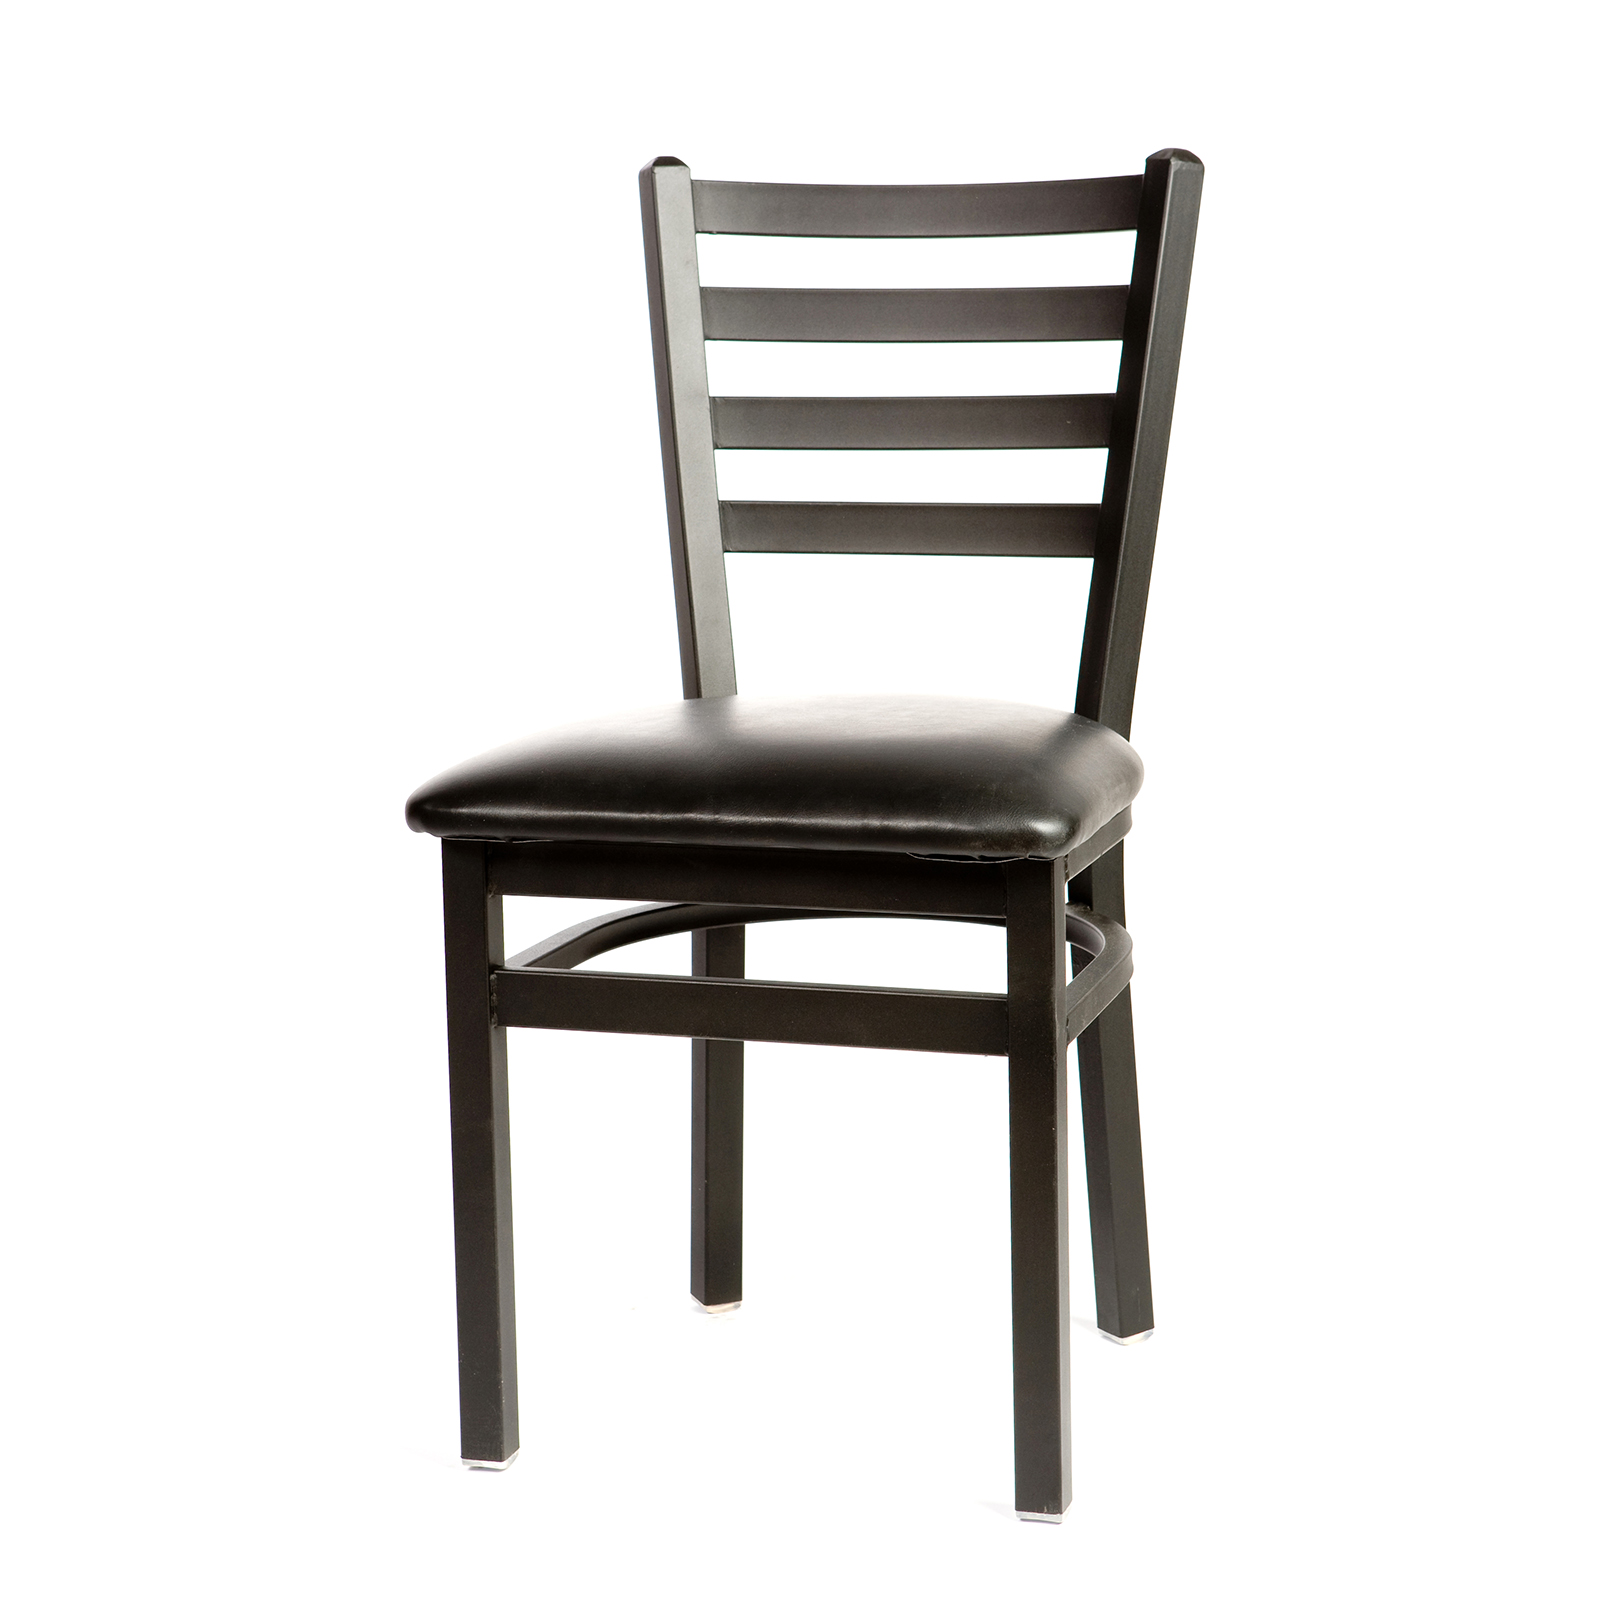 Oak Street SL2160 chair, side, indoor